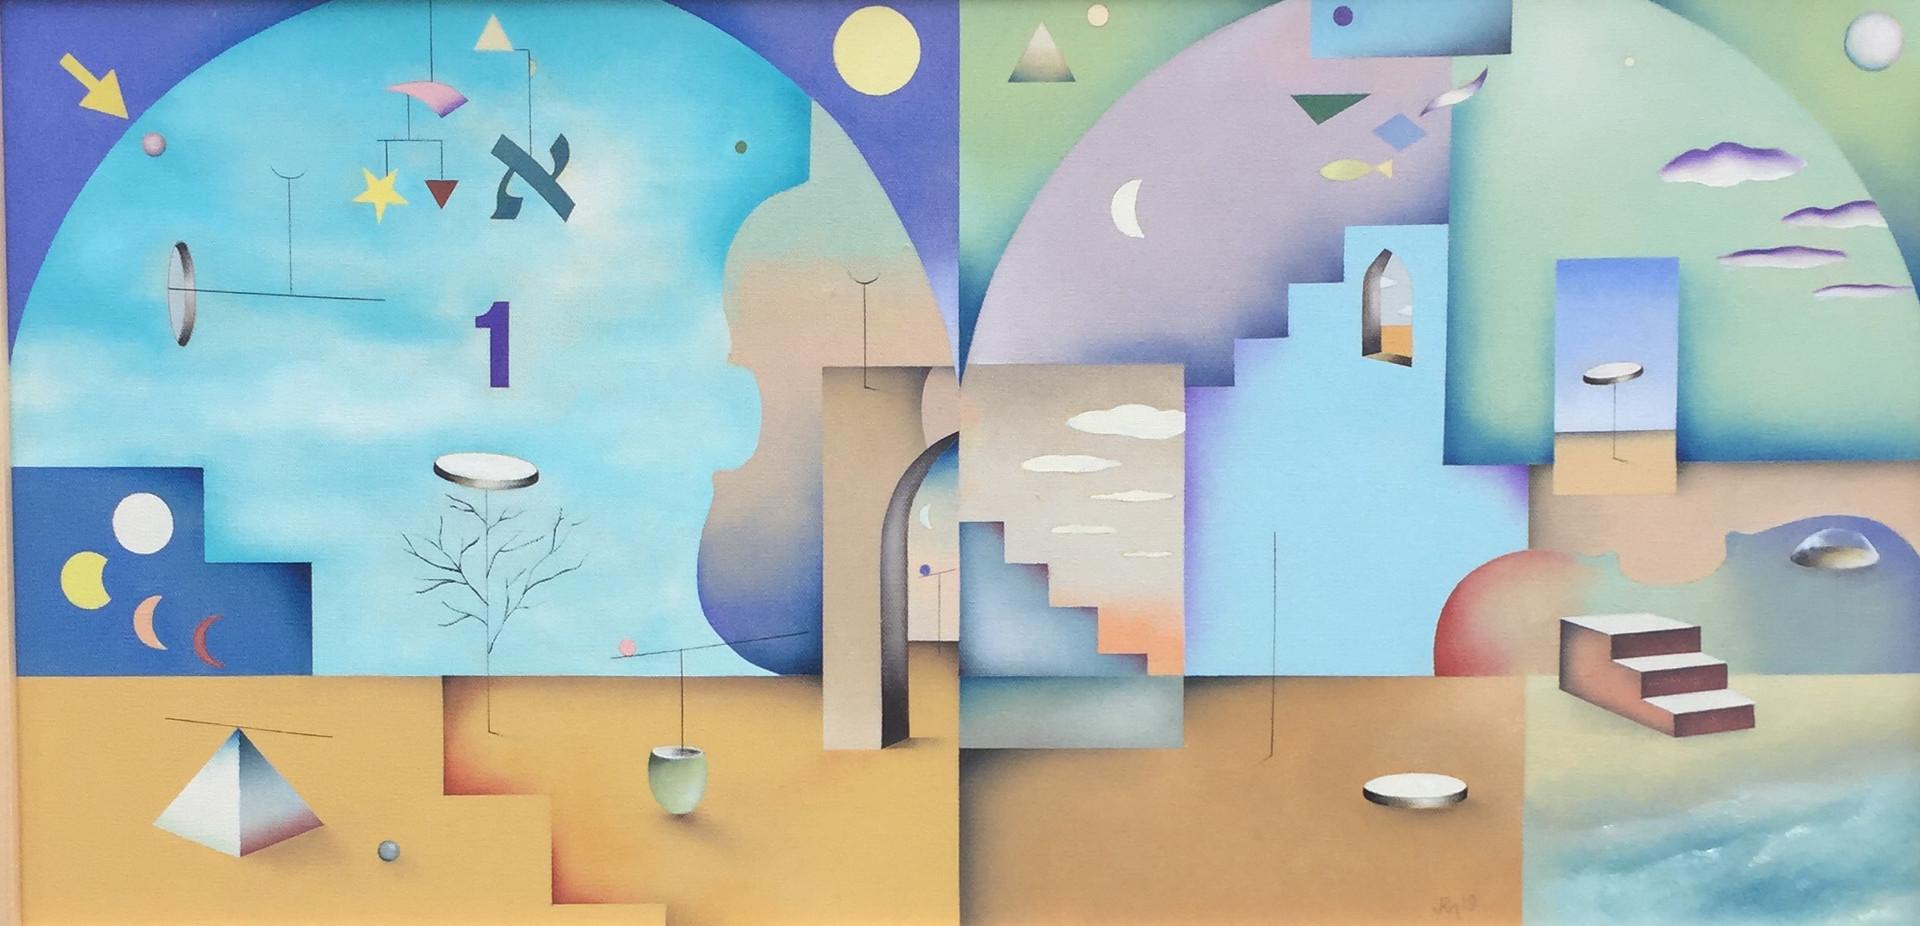 Jeffrey Melzack, Koyaanjsqatsi, 2019, 15 x 30 inches, Oil on canvas